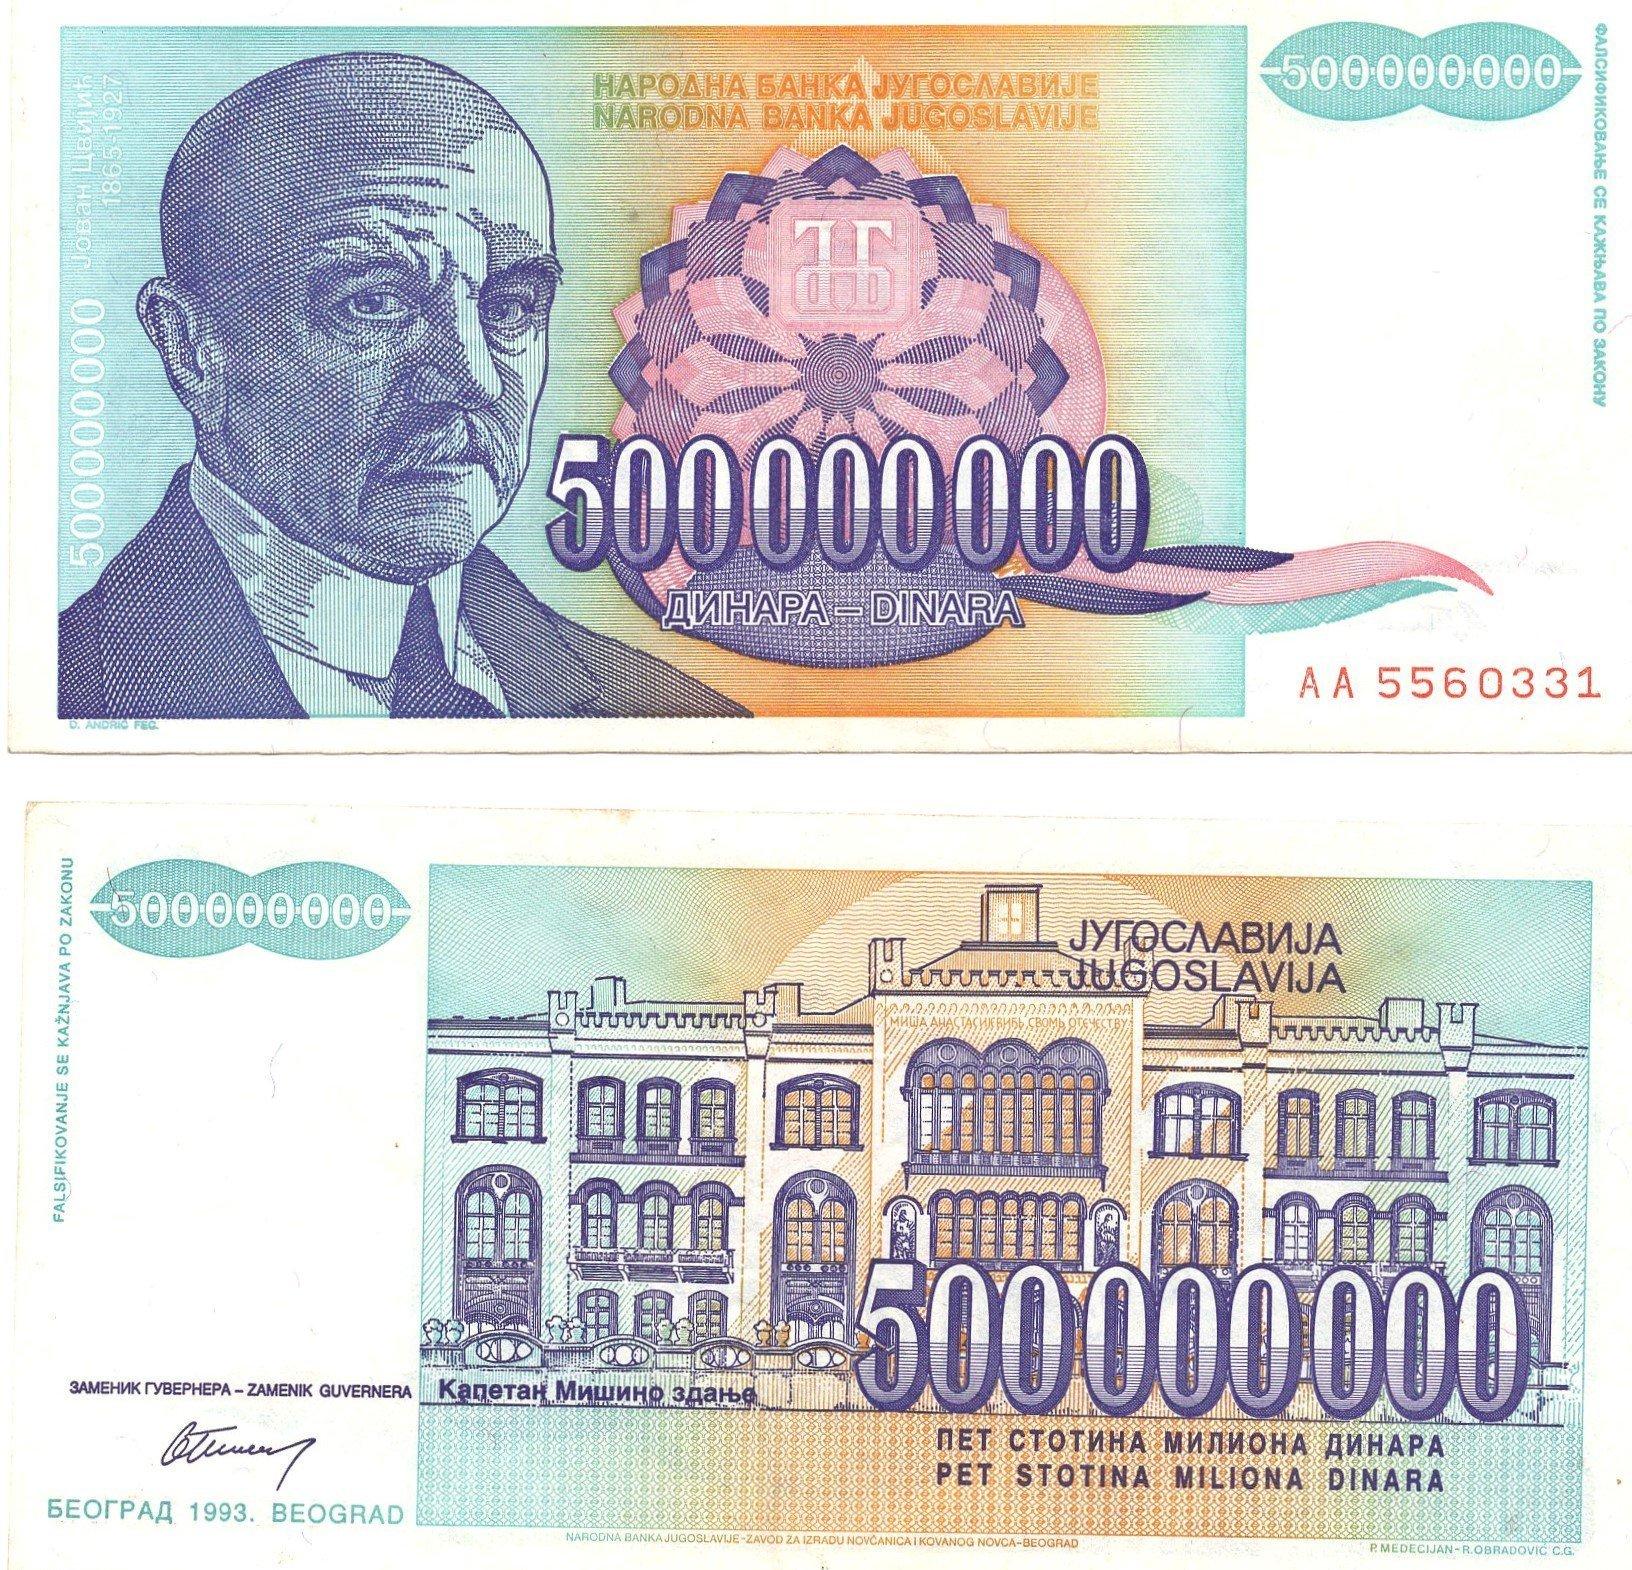 Yugoslavia 500m dinara 1993